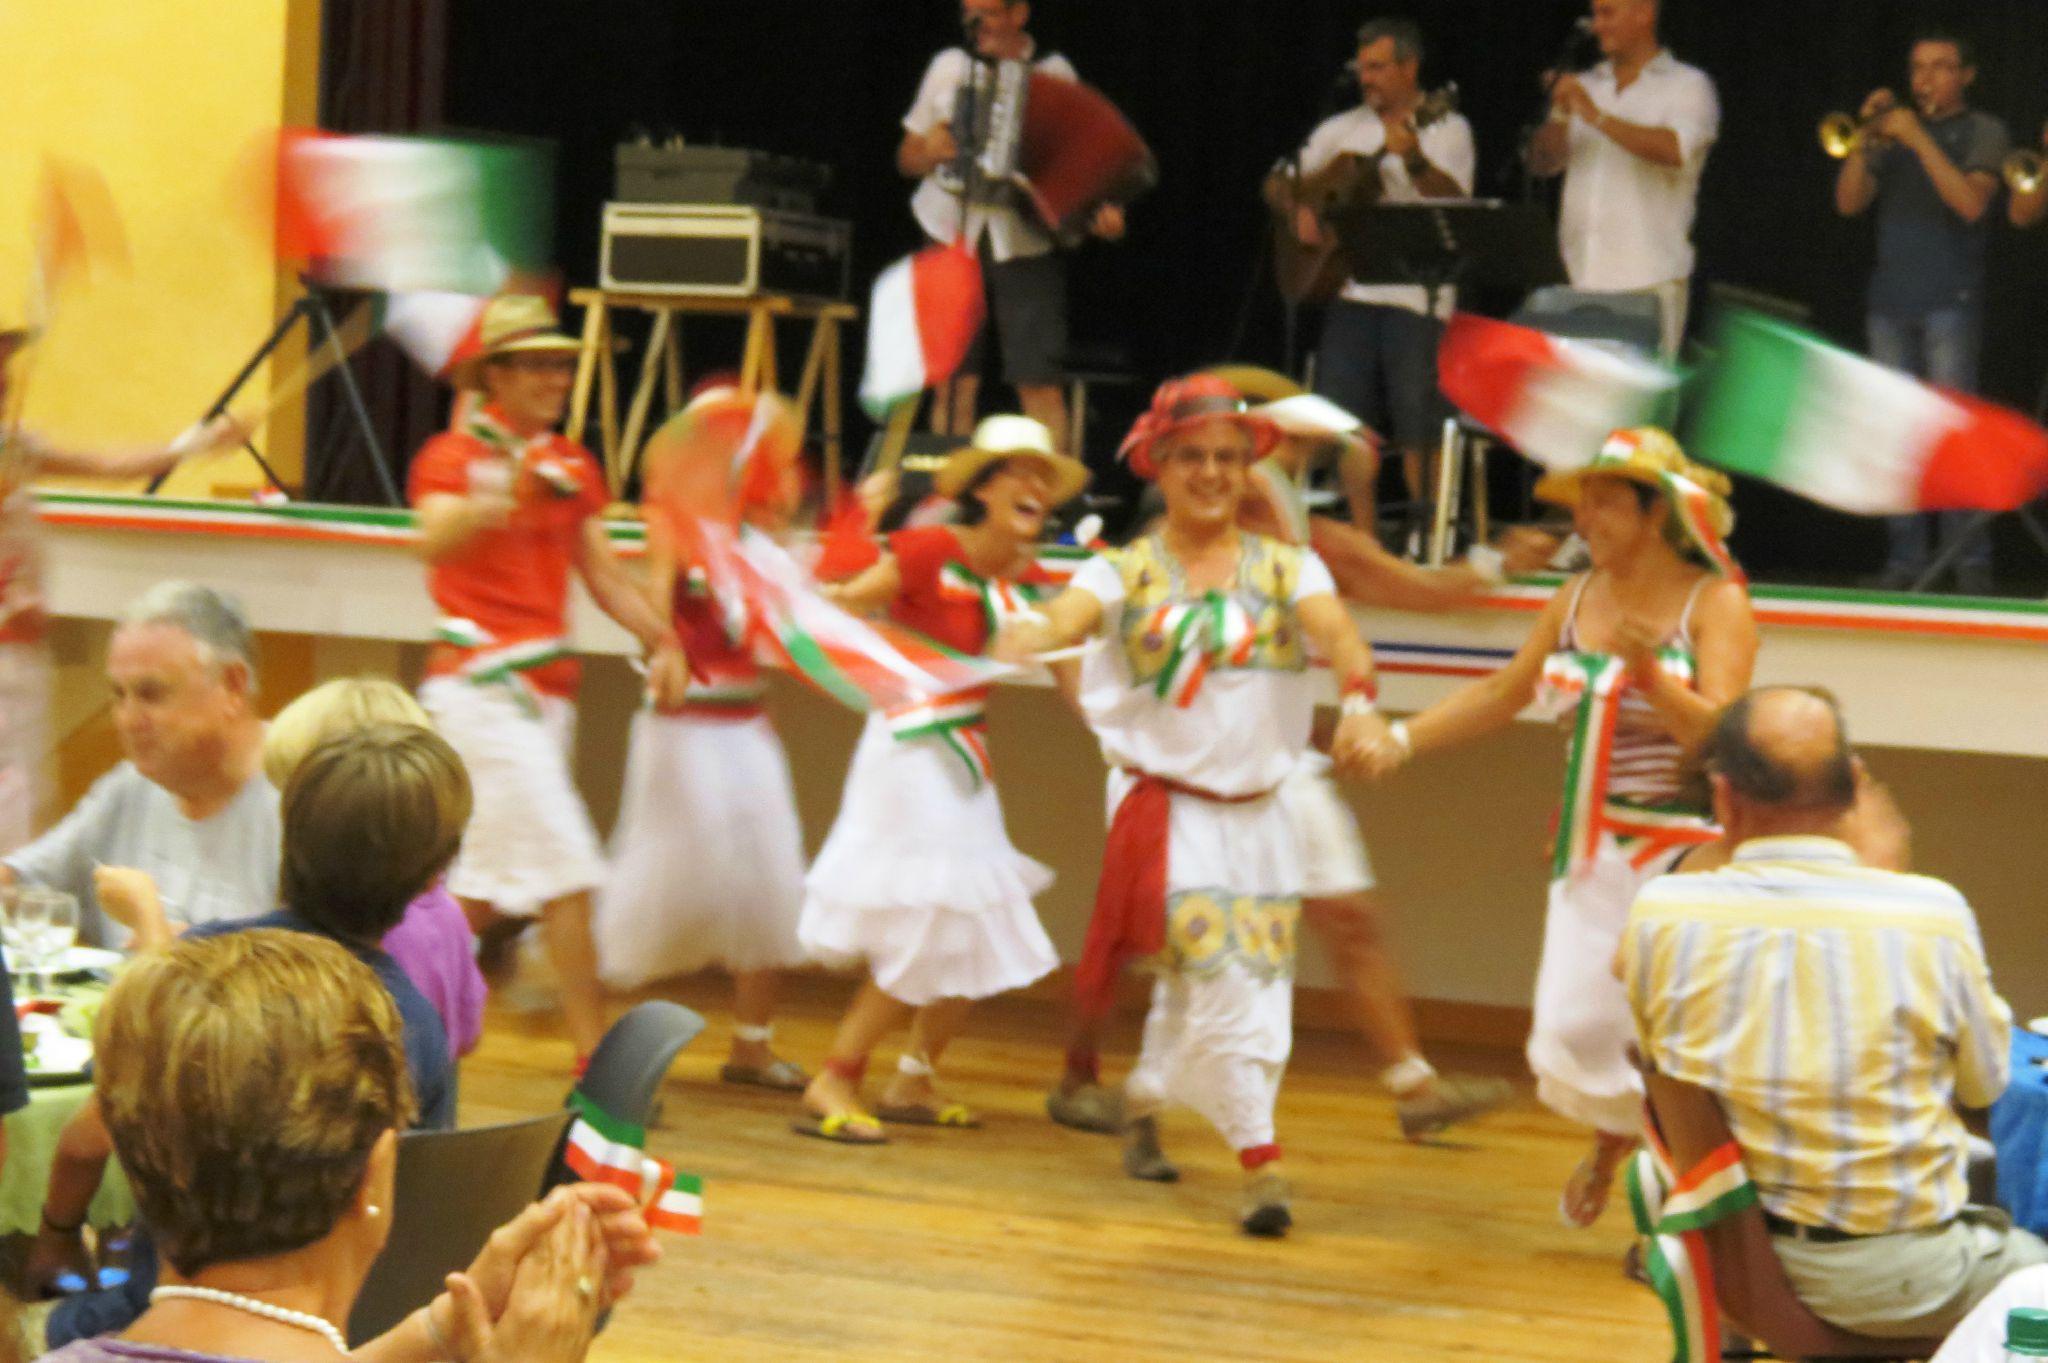 Soirée Paella (Photos PHILIPPE) (10)